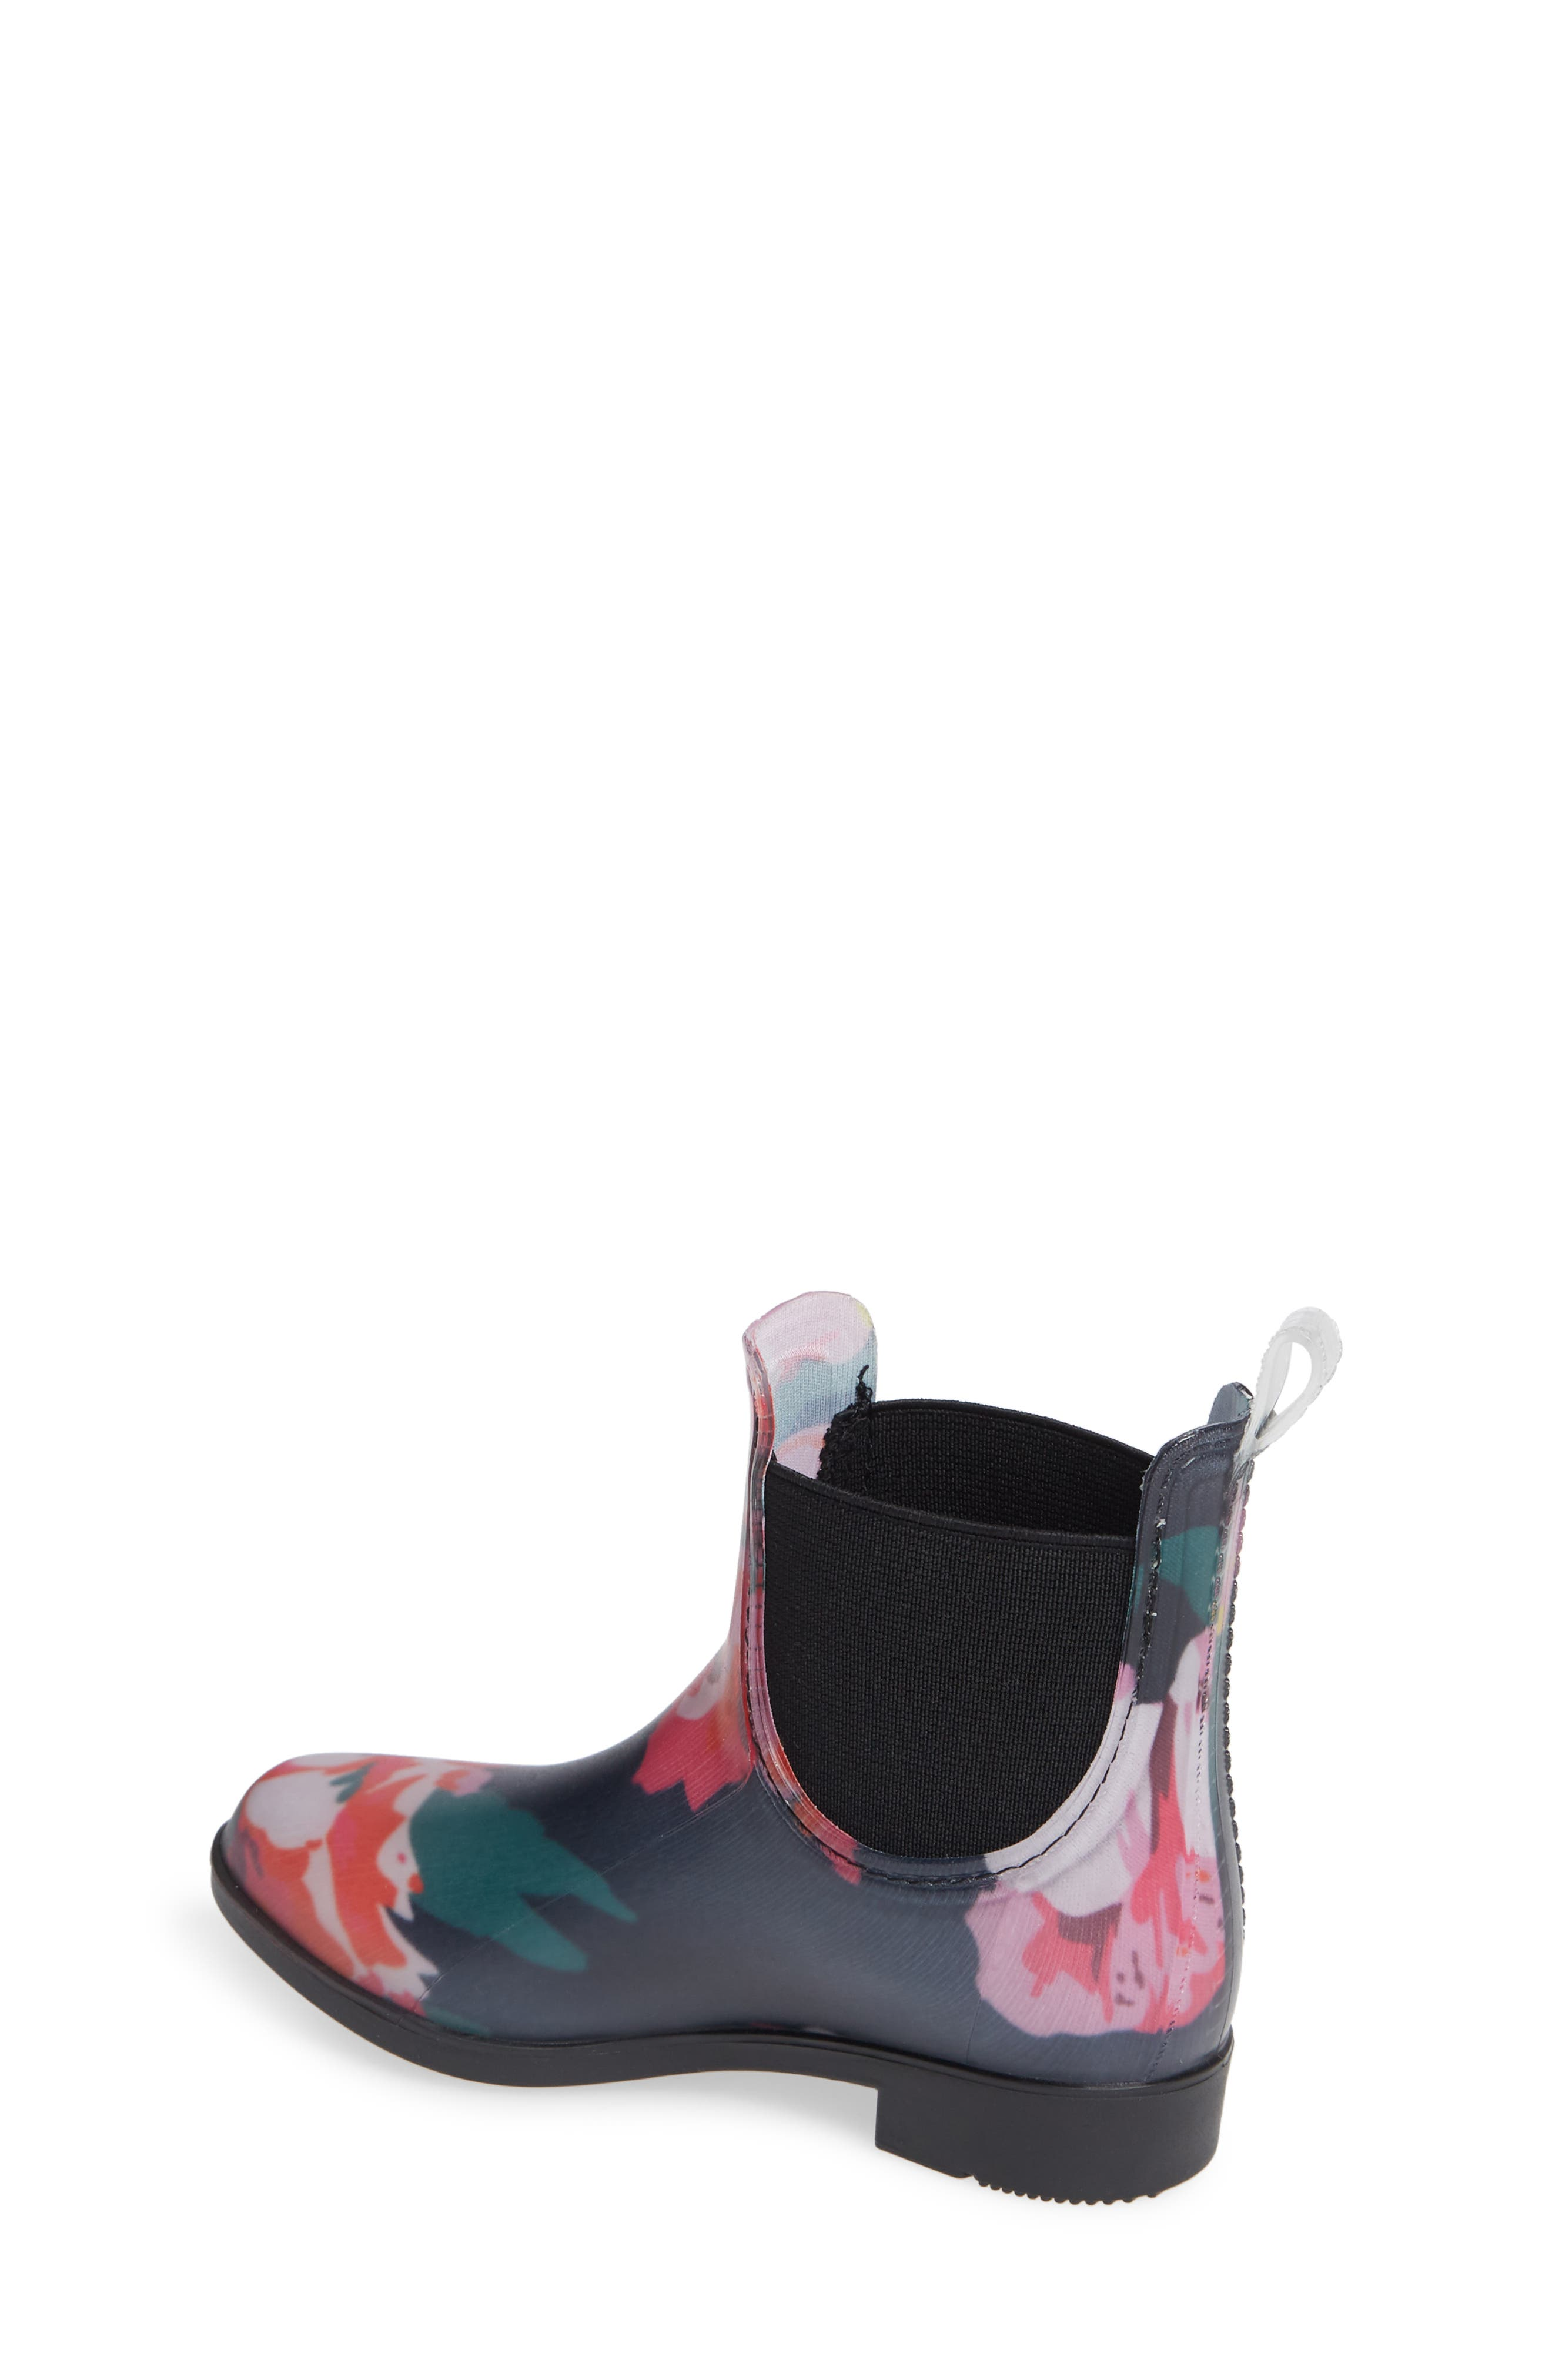 Chelsea Rain Boot,                             Alternate thumbnail 2, color,                             NAVY GRANNY FLORAL